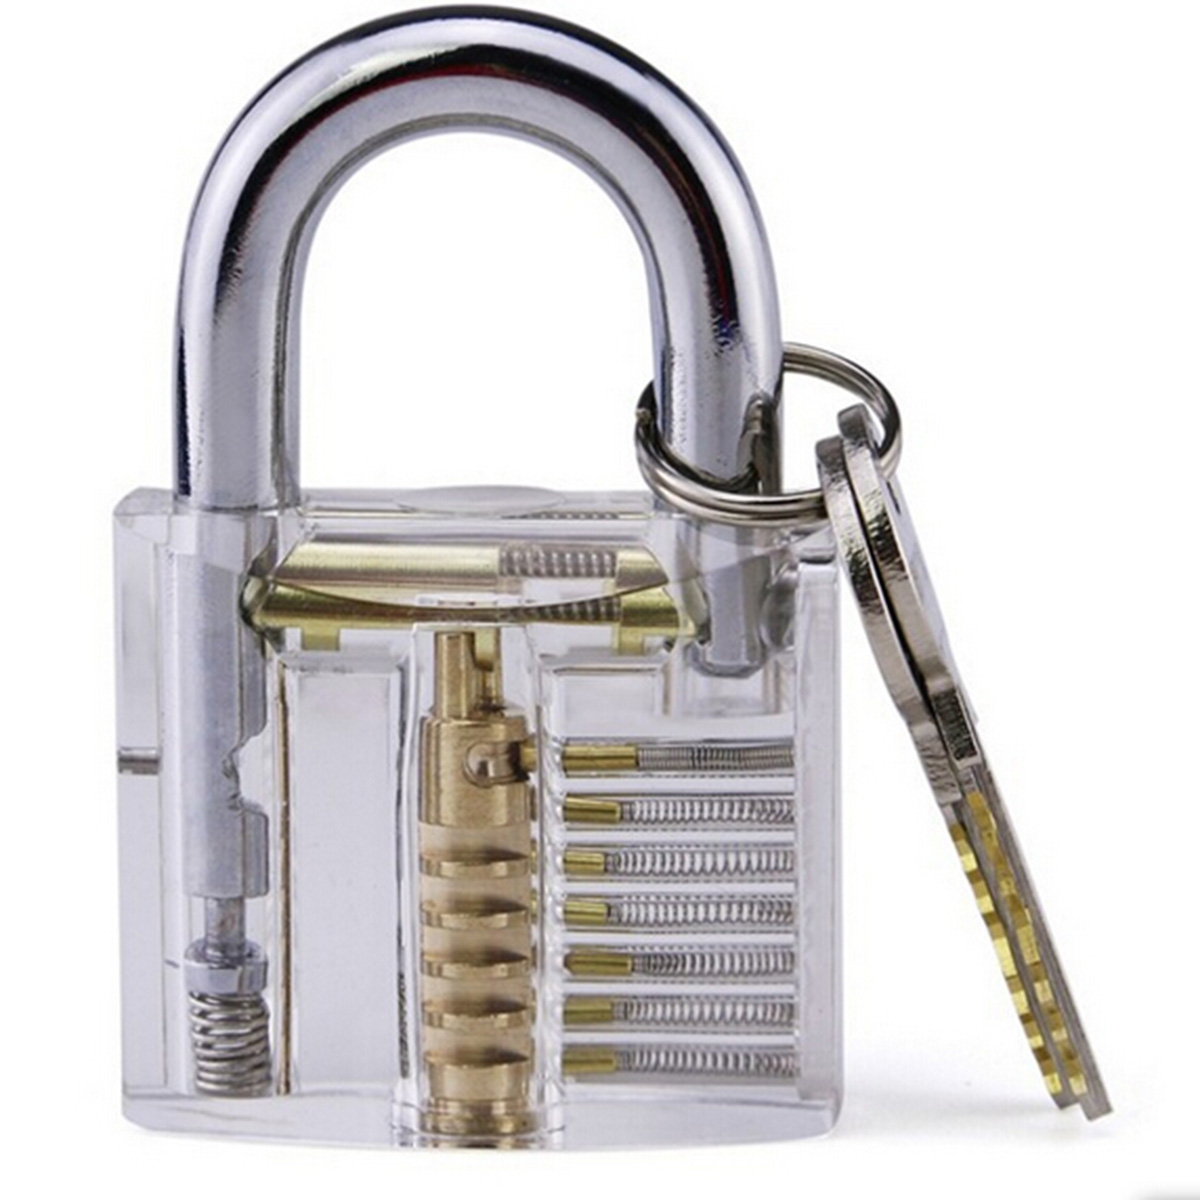 Transparent Visible Pick Cutaway Practice Padlock Lock With Broken Key Removing Hook Kit Extractor Set Locksmith Wrench Tool